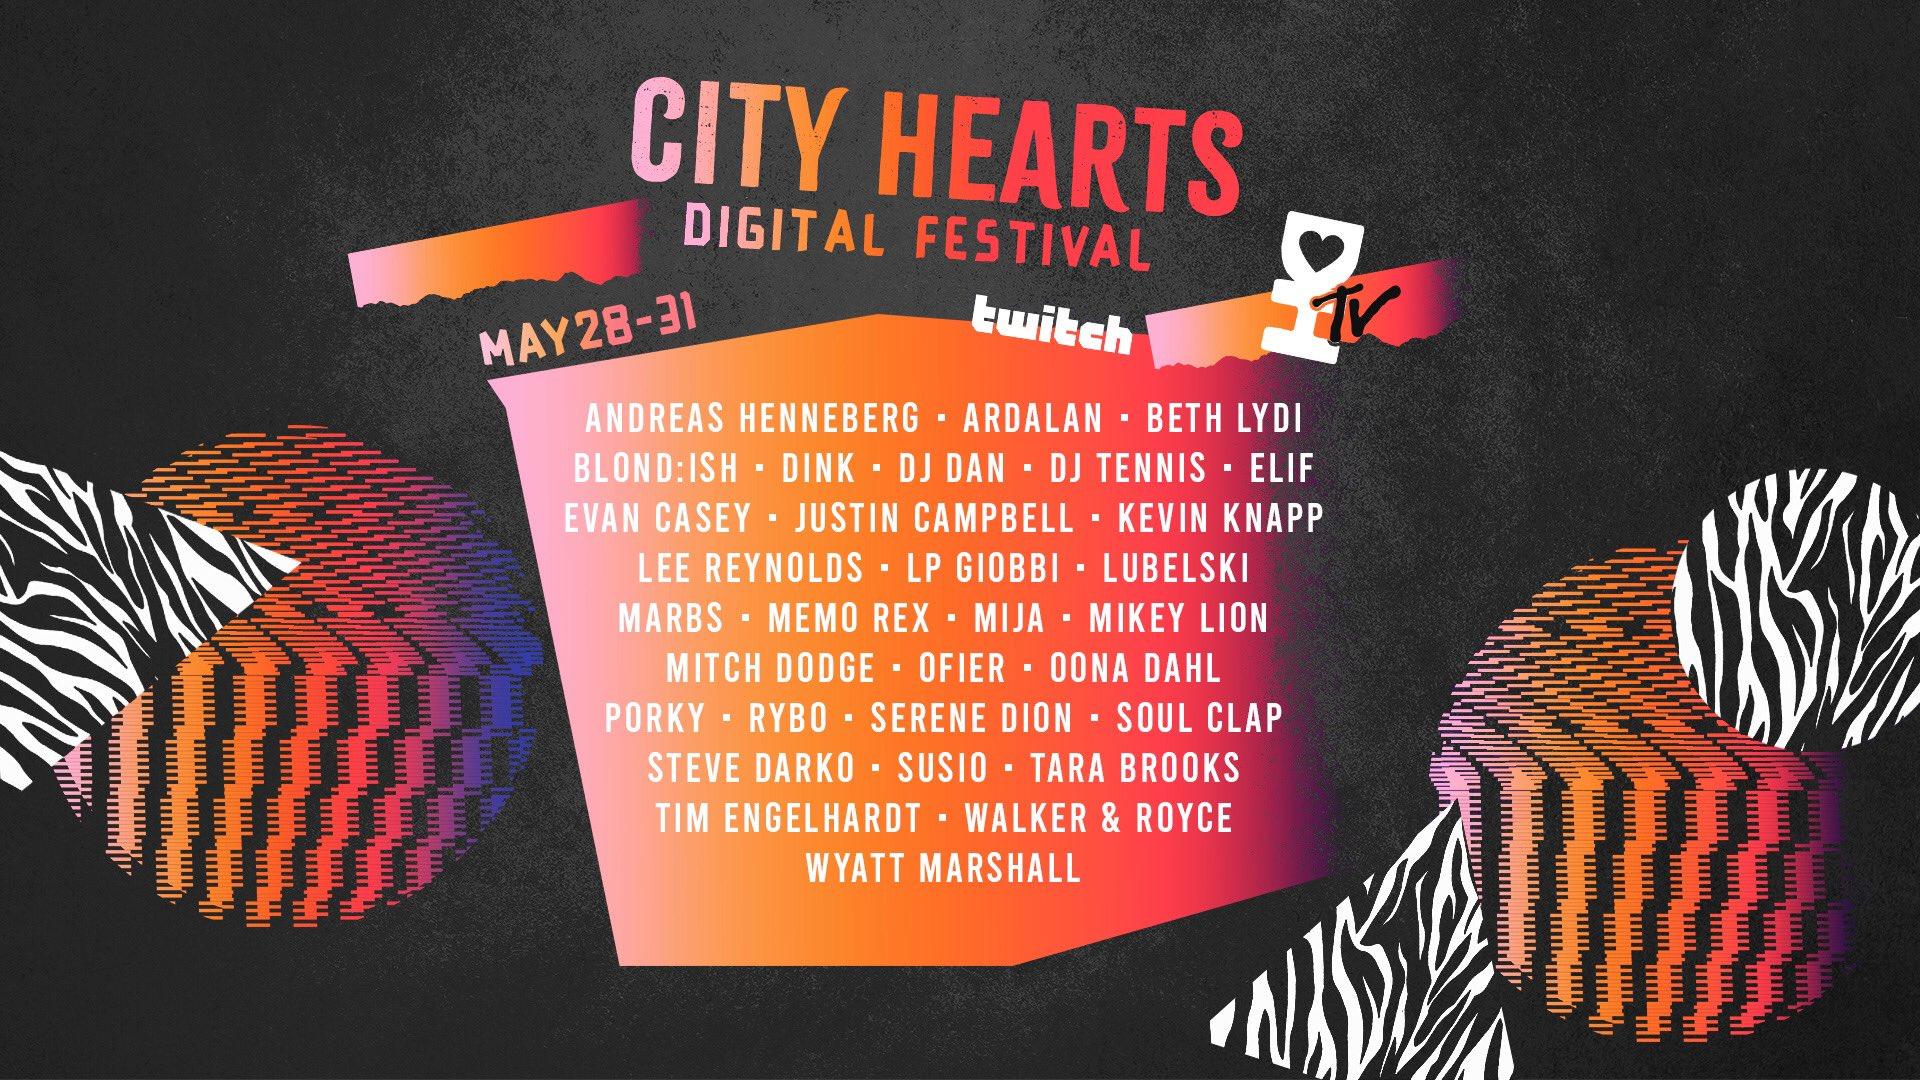 City Hearts Digital Festival Lineup